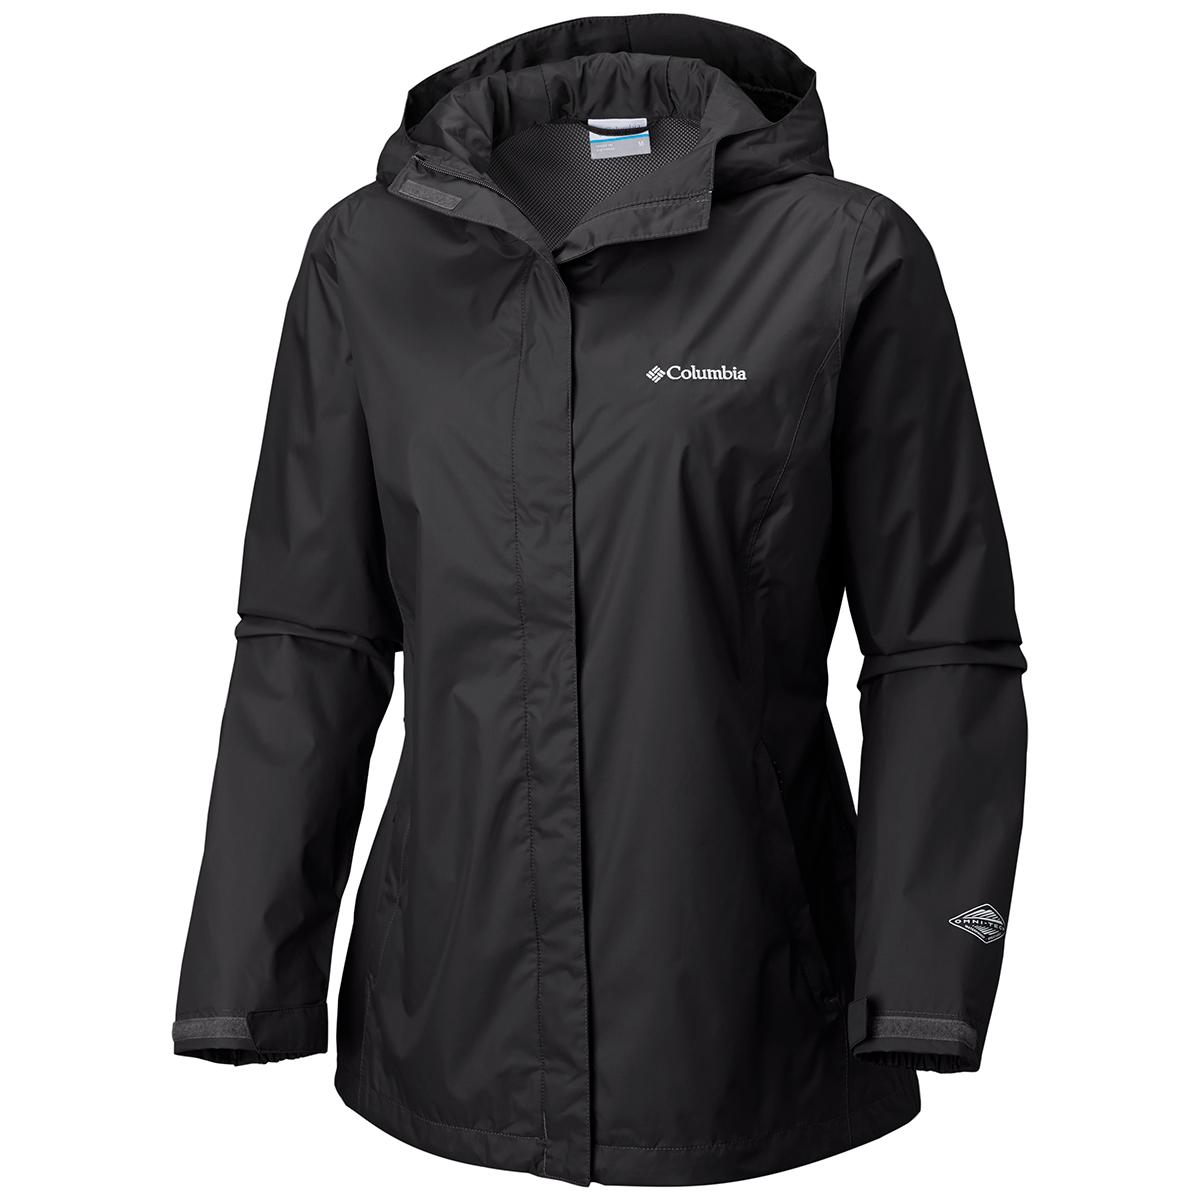 Columbia Women's Arcadia Rain Jacket - Black, XS